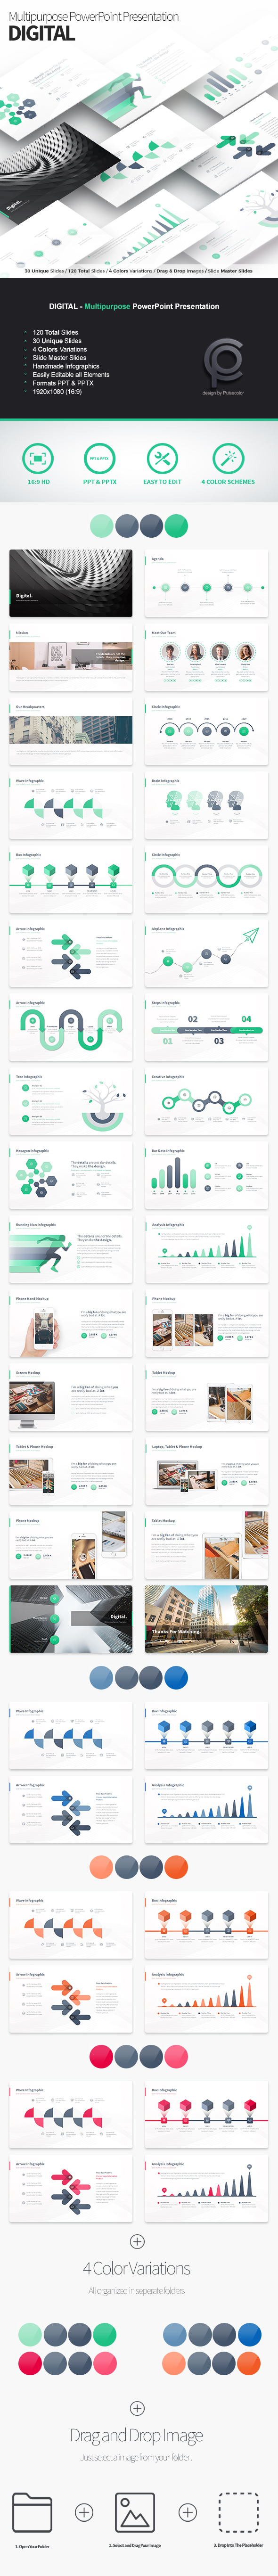 Digital - Multipurpose PowerPoint Presentation